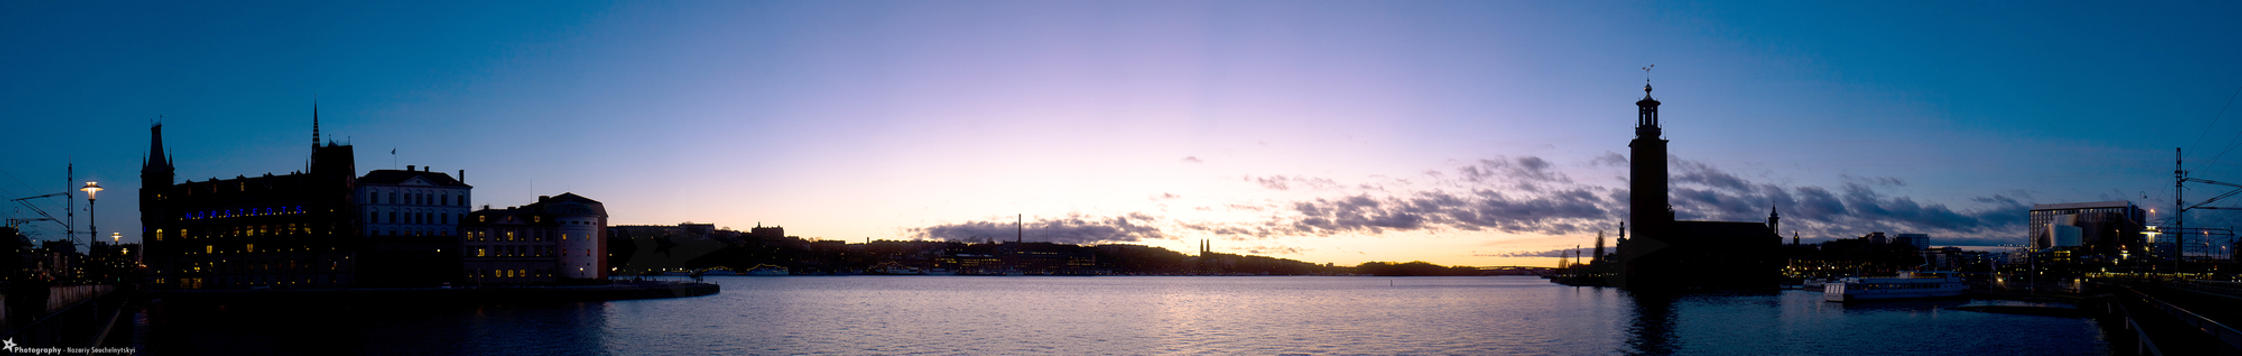 Stockholm Sunset by MiddleStar